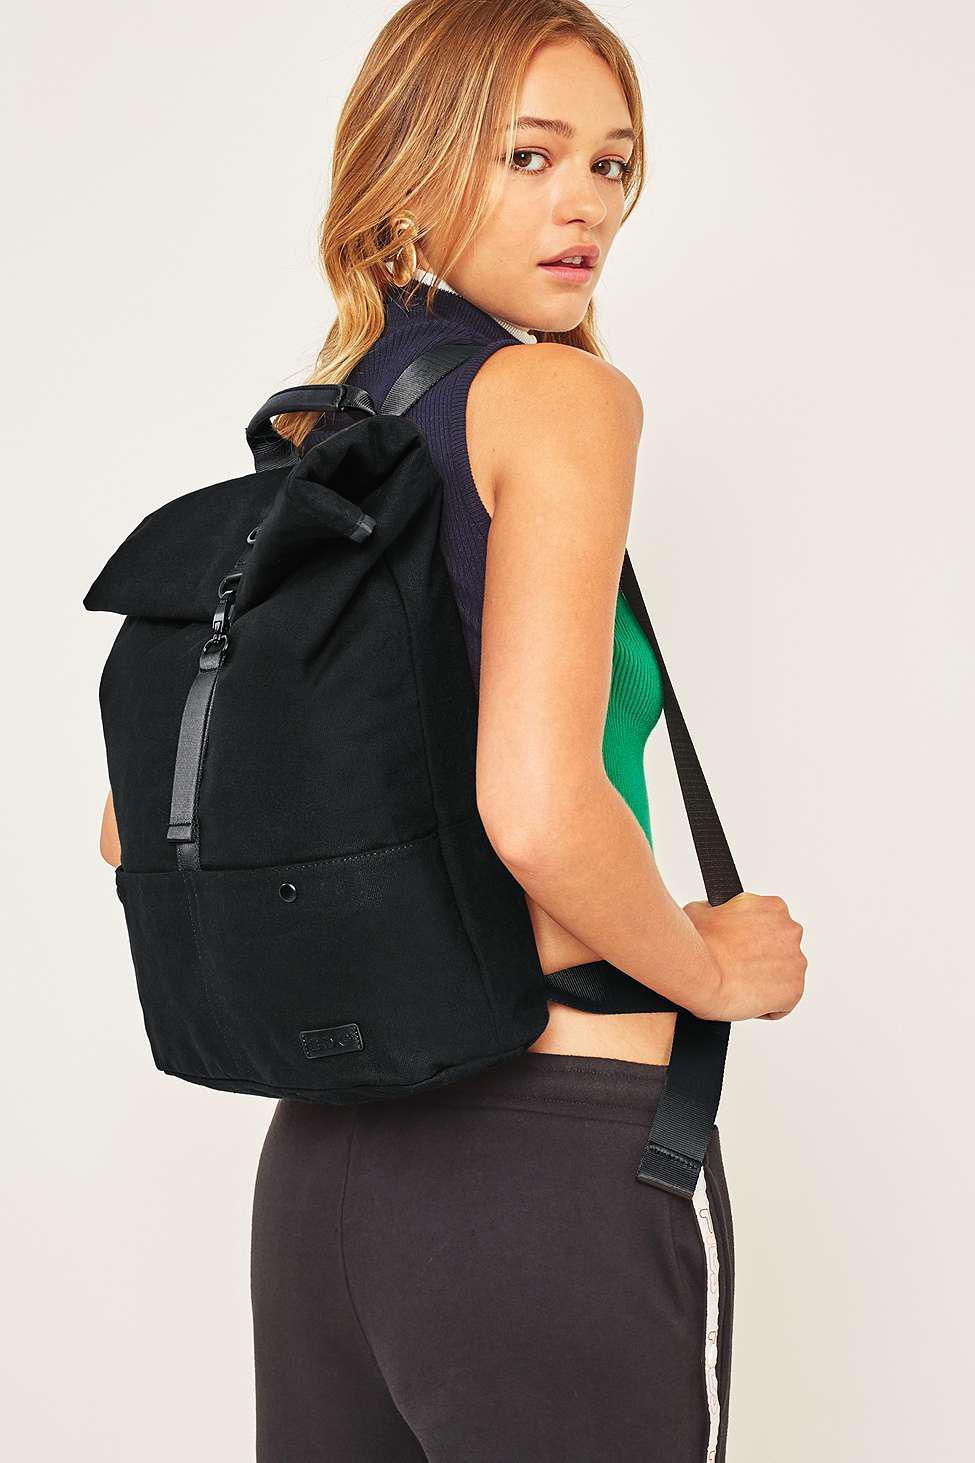 Bdg Canvas Roll Top Backpack – TLMODA